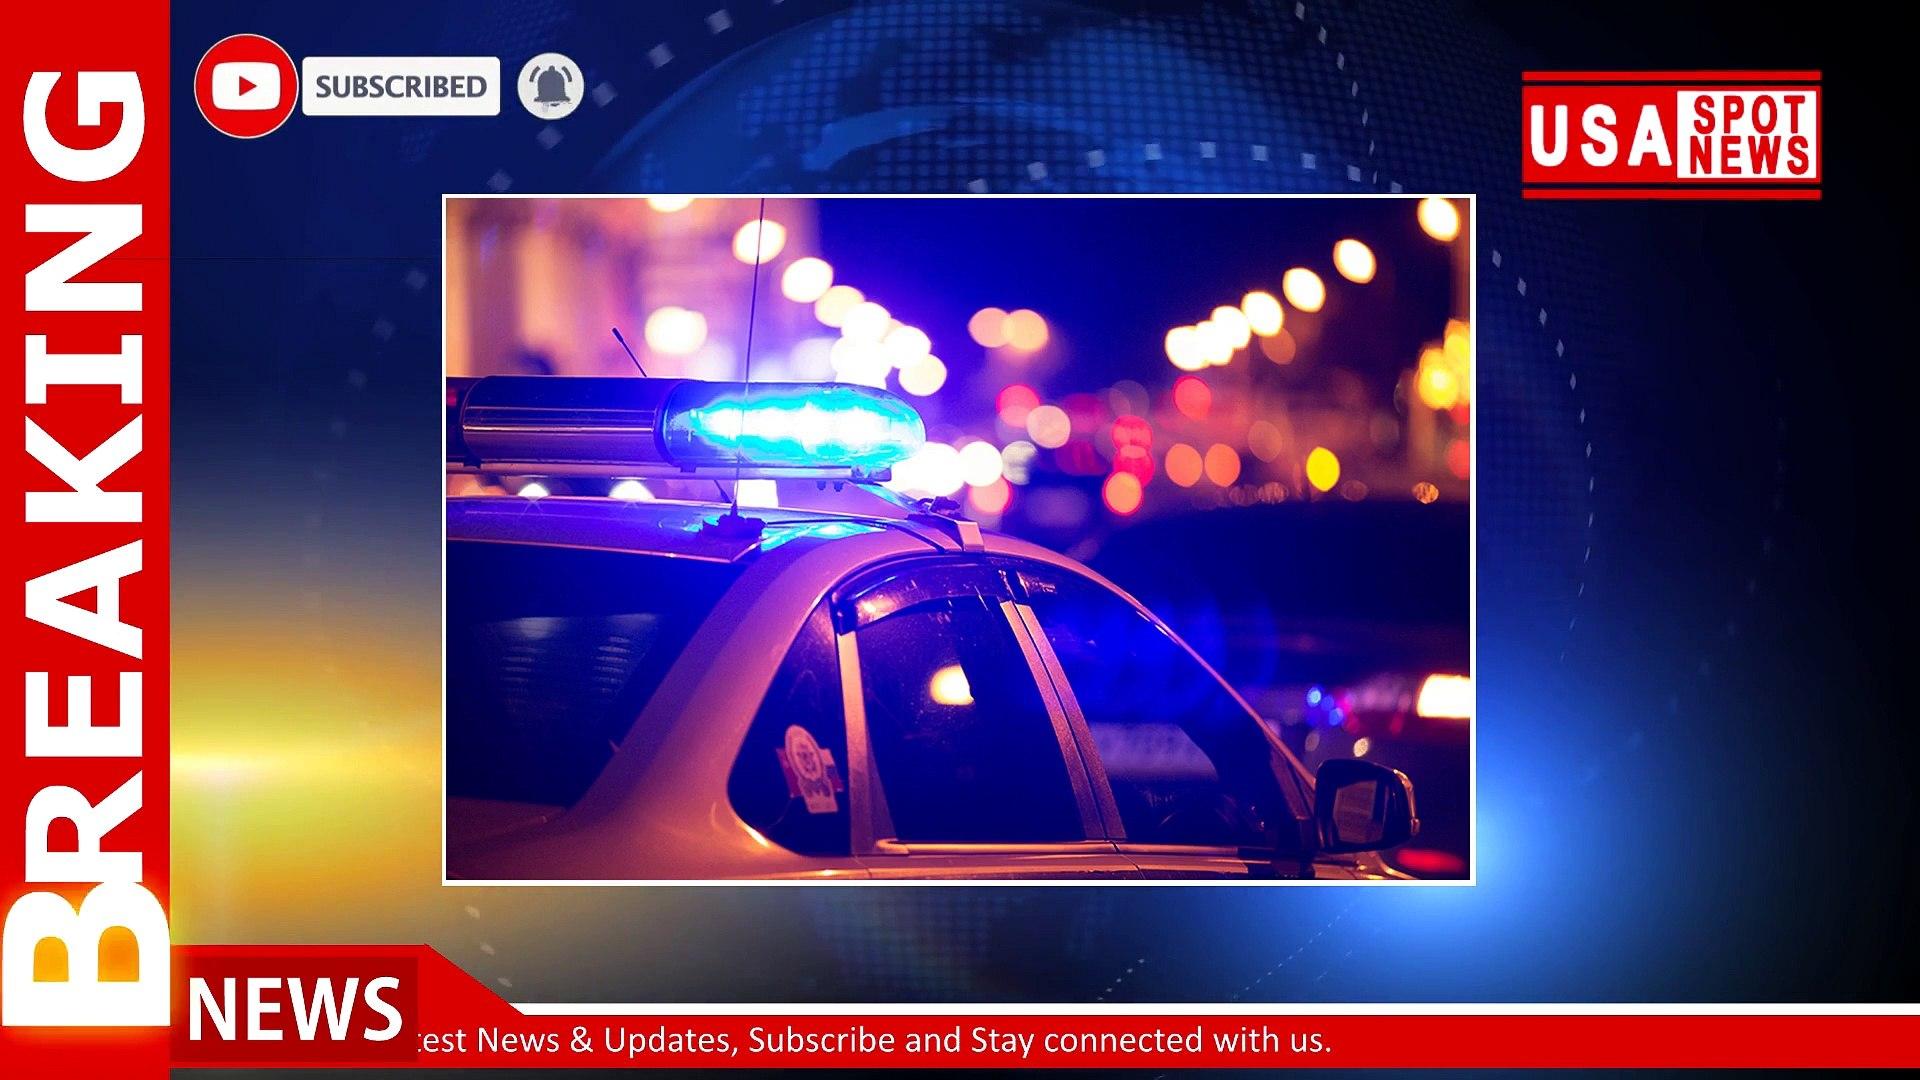 03 Jan 2021 | Morning News Headlines | Breaking News | News Today | USA Spot News